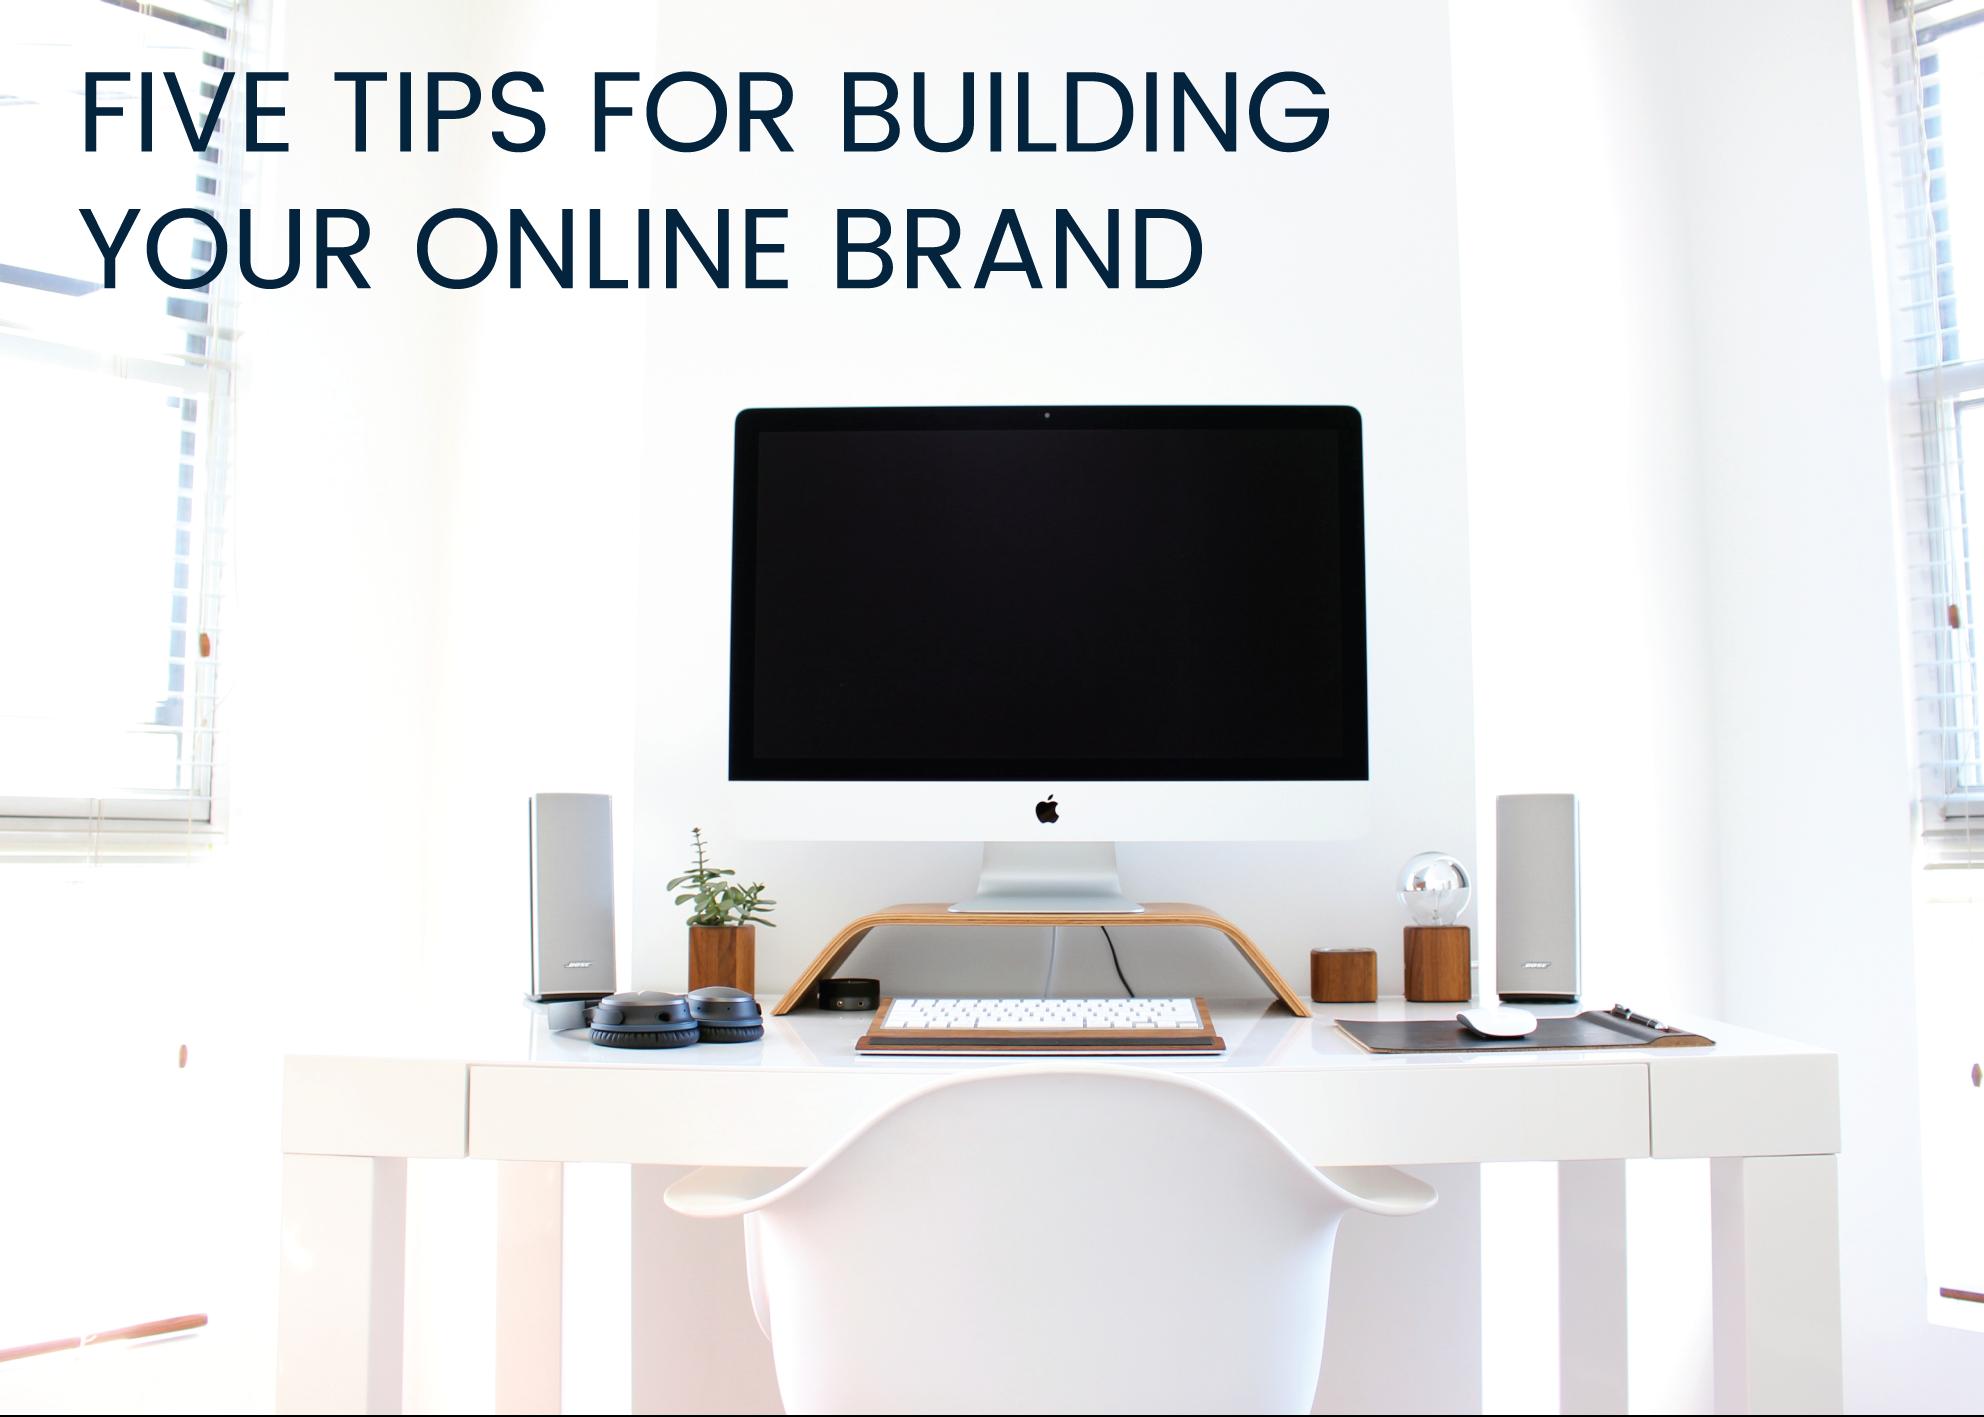 5 expert tips on building an online brand